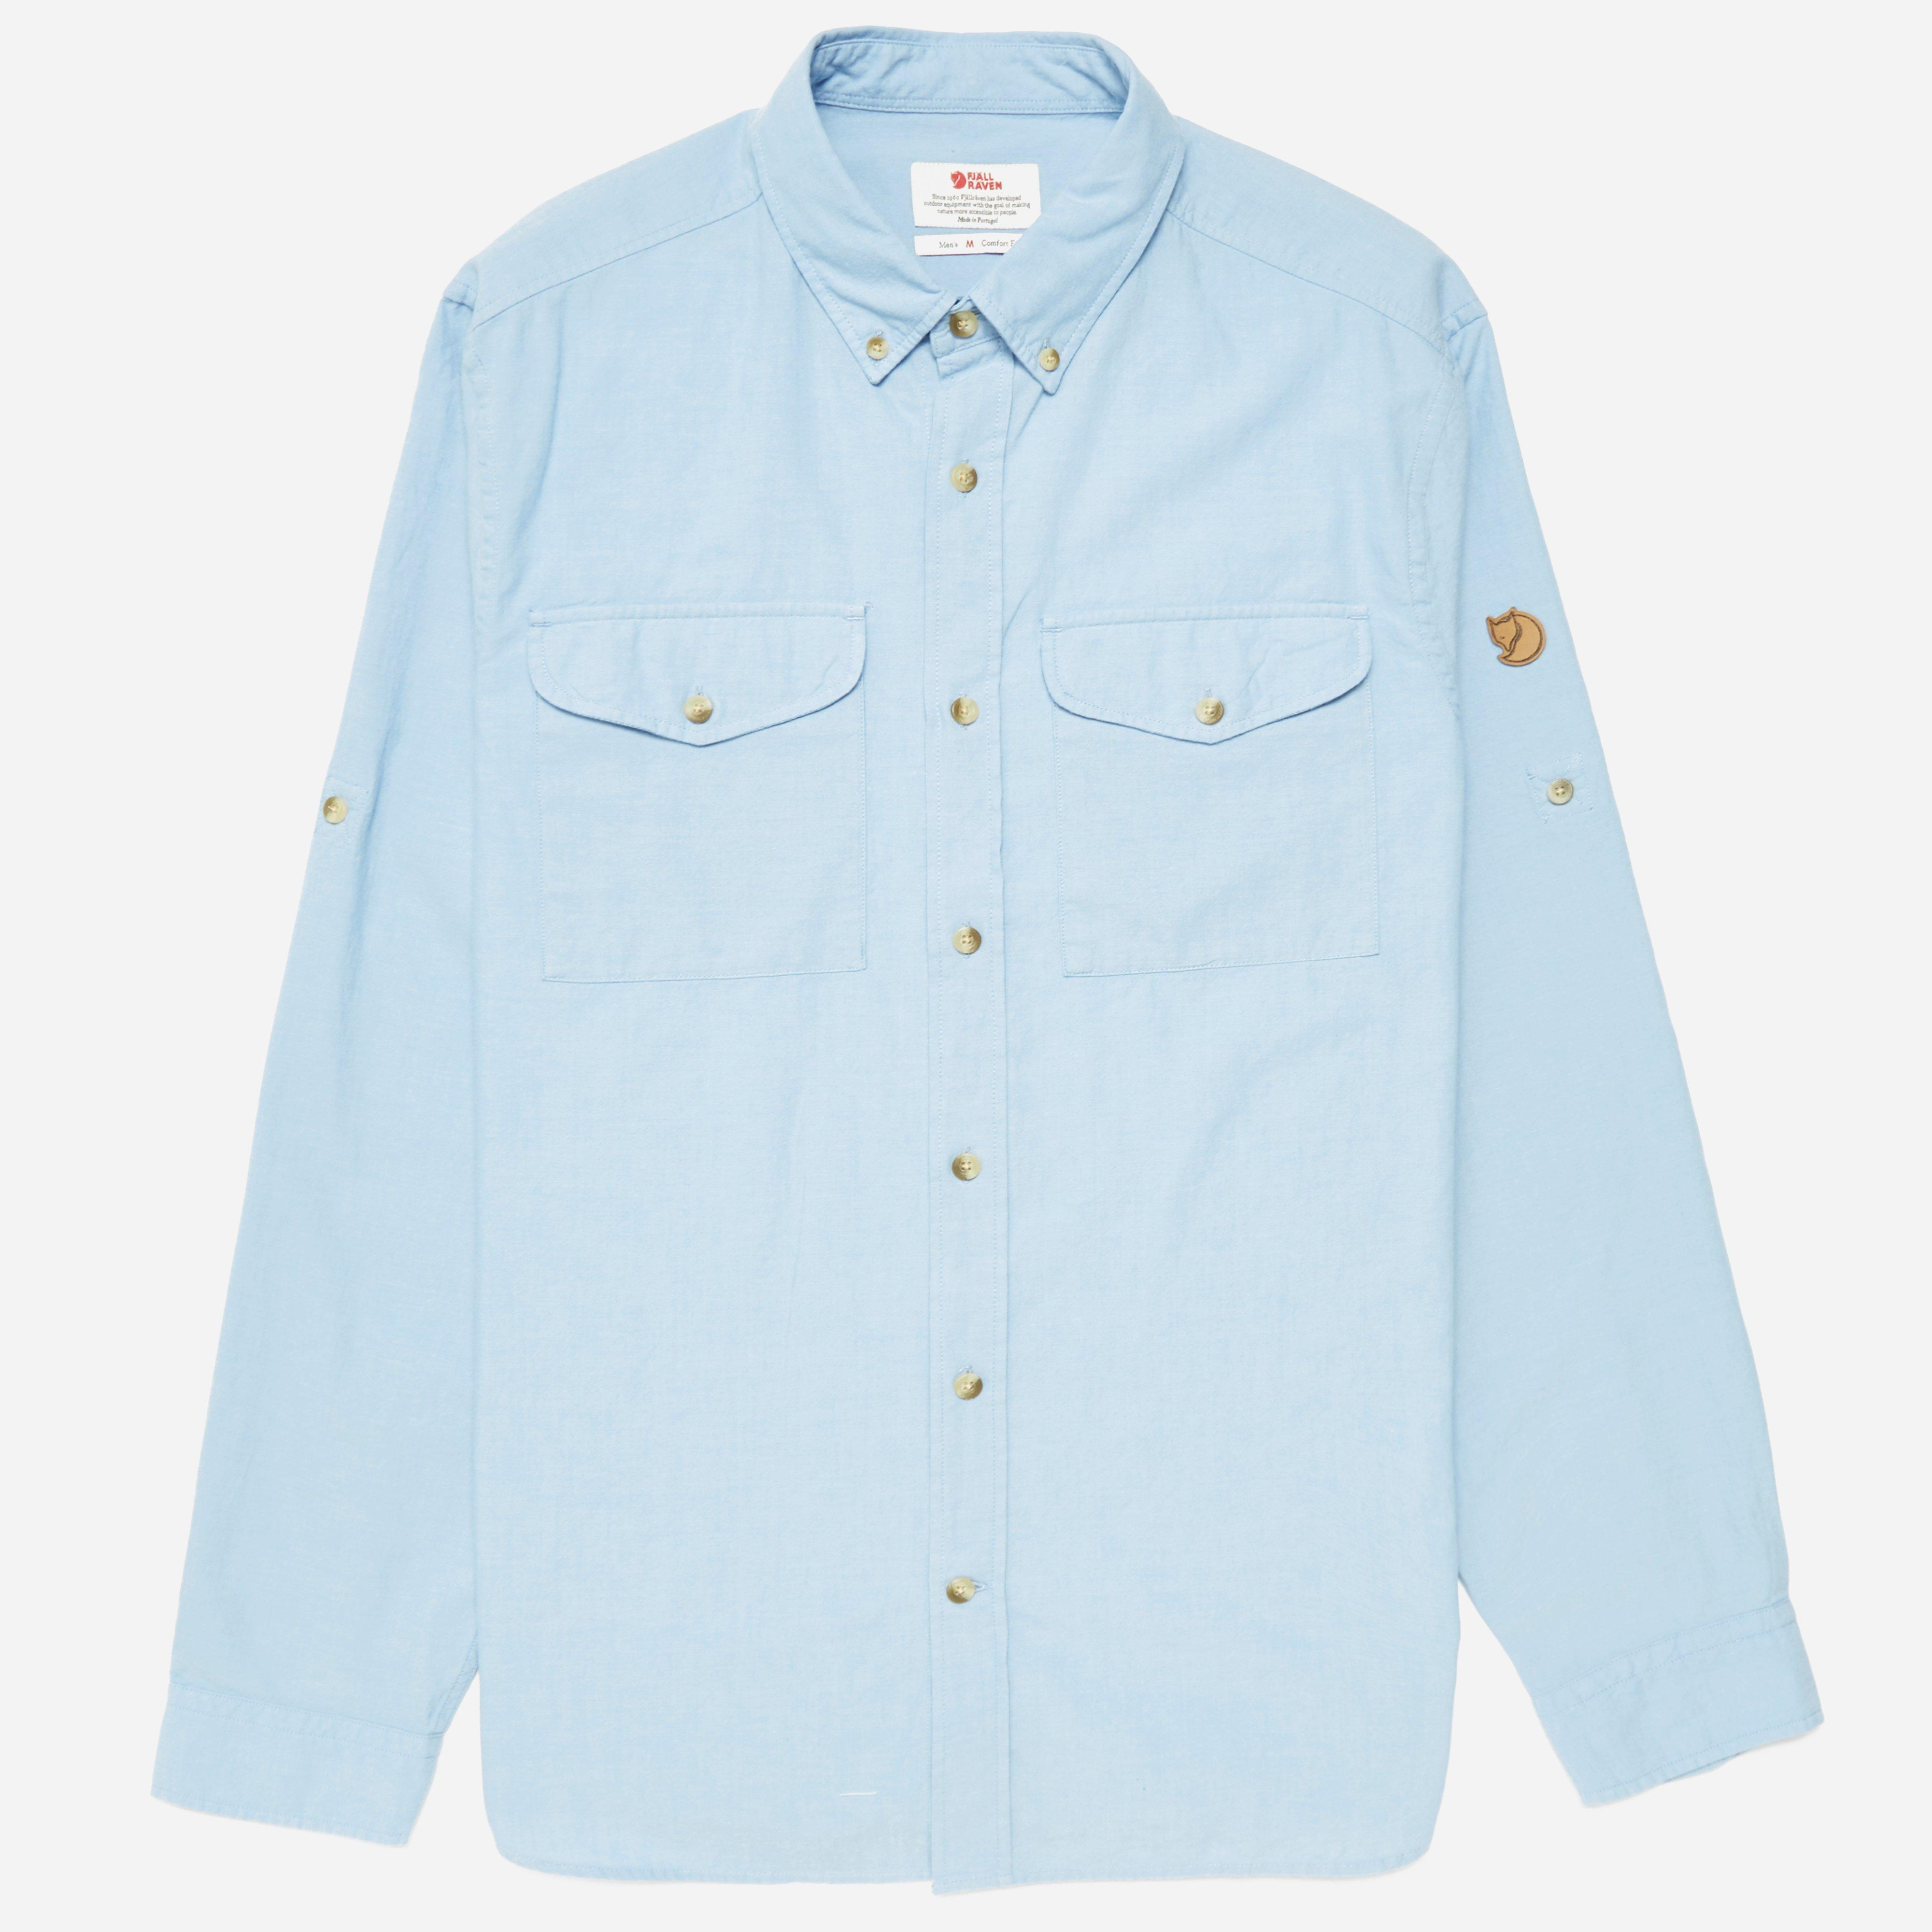 Fjallraven Ovik Chambray Shirt